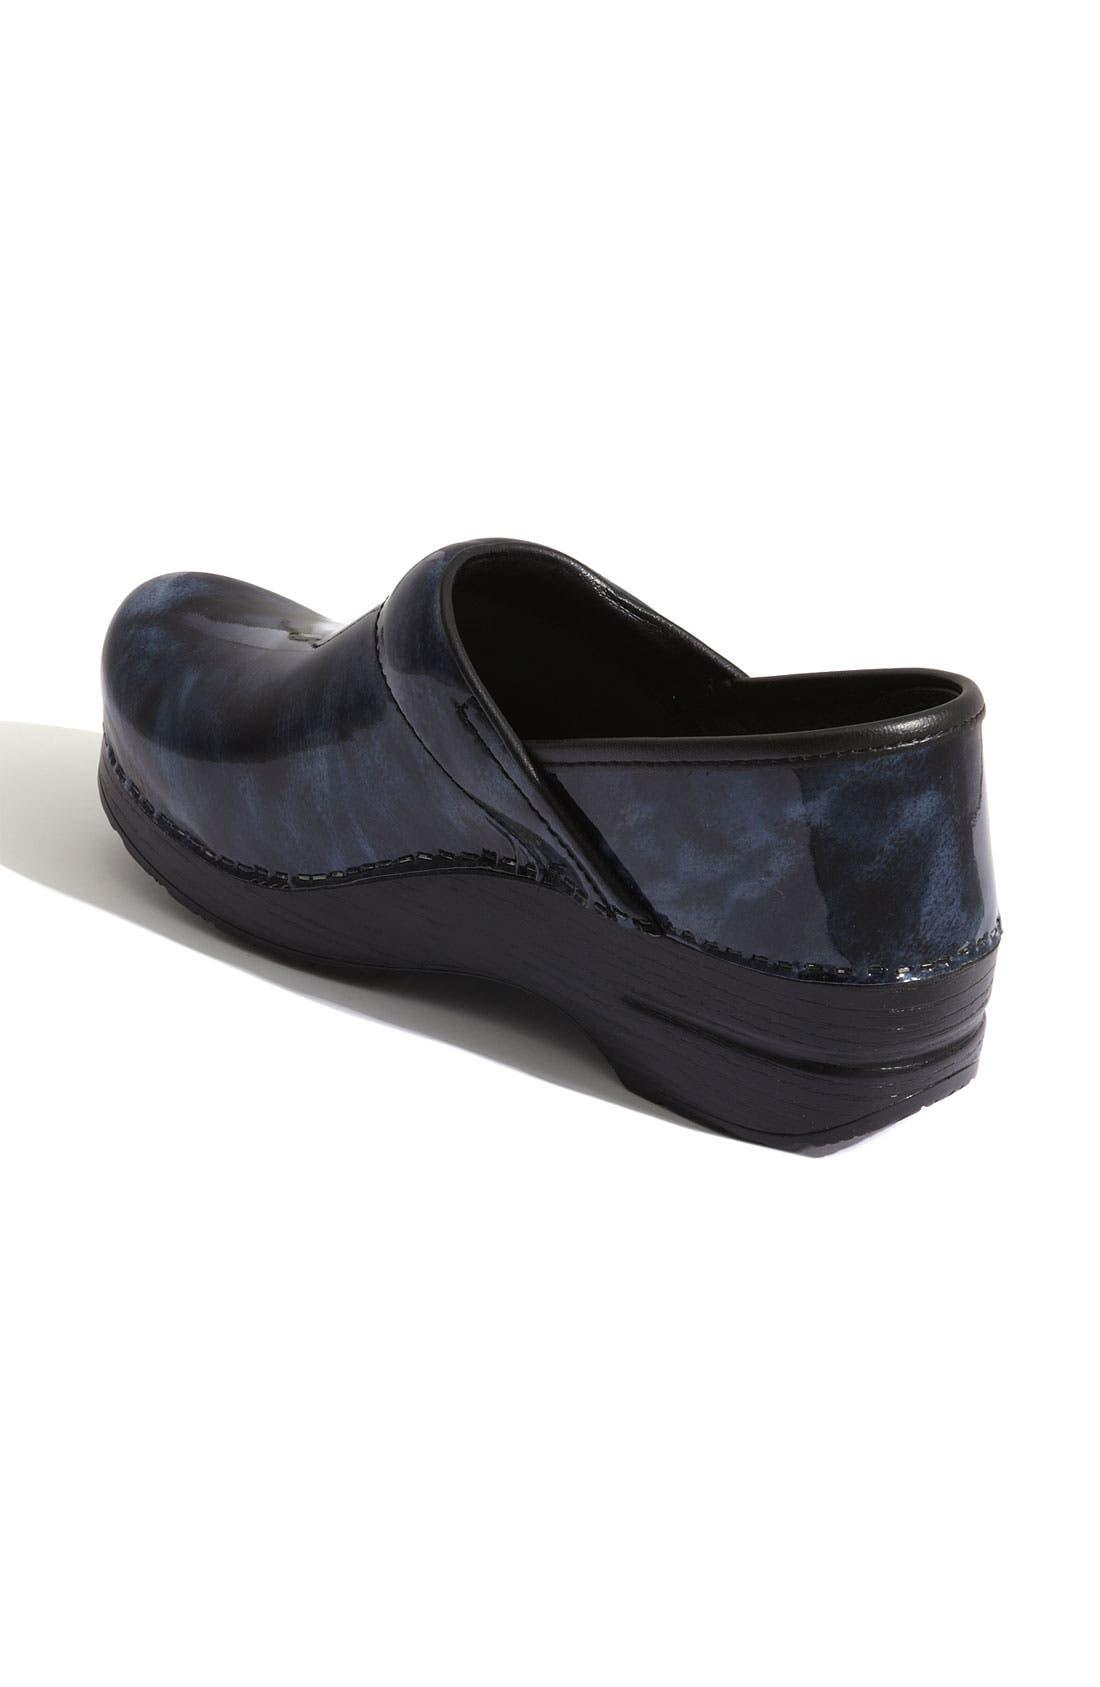 Alternate Image 2  - Dansko 'Professional' Marbled Patent Leather Clog